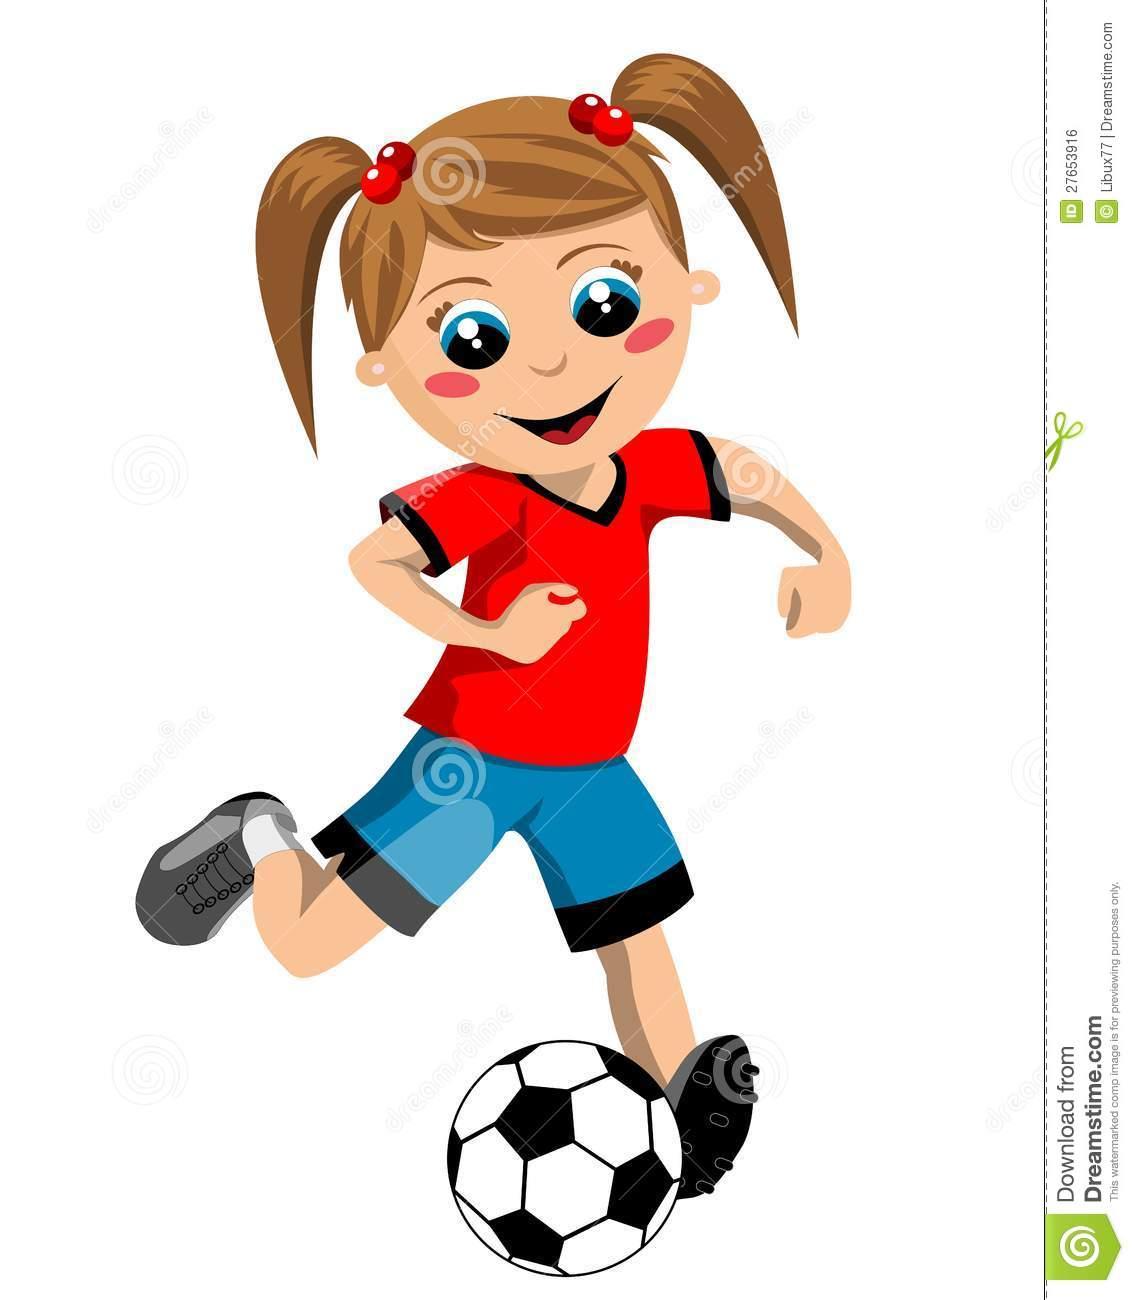 Cartoon girl soccer player kicking ball